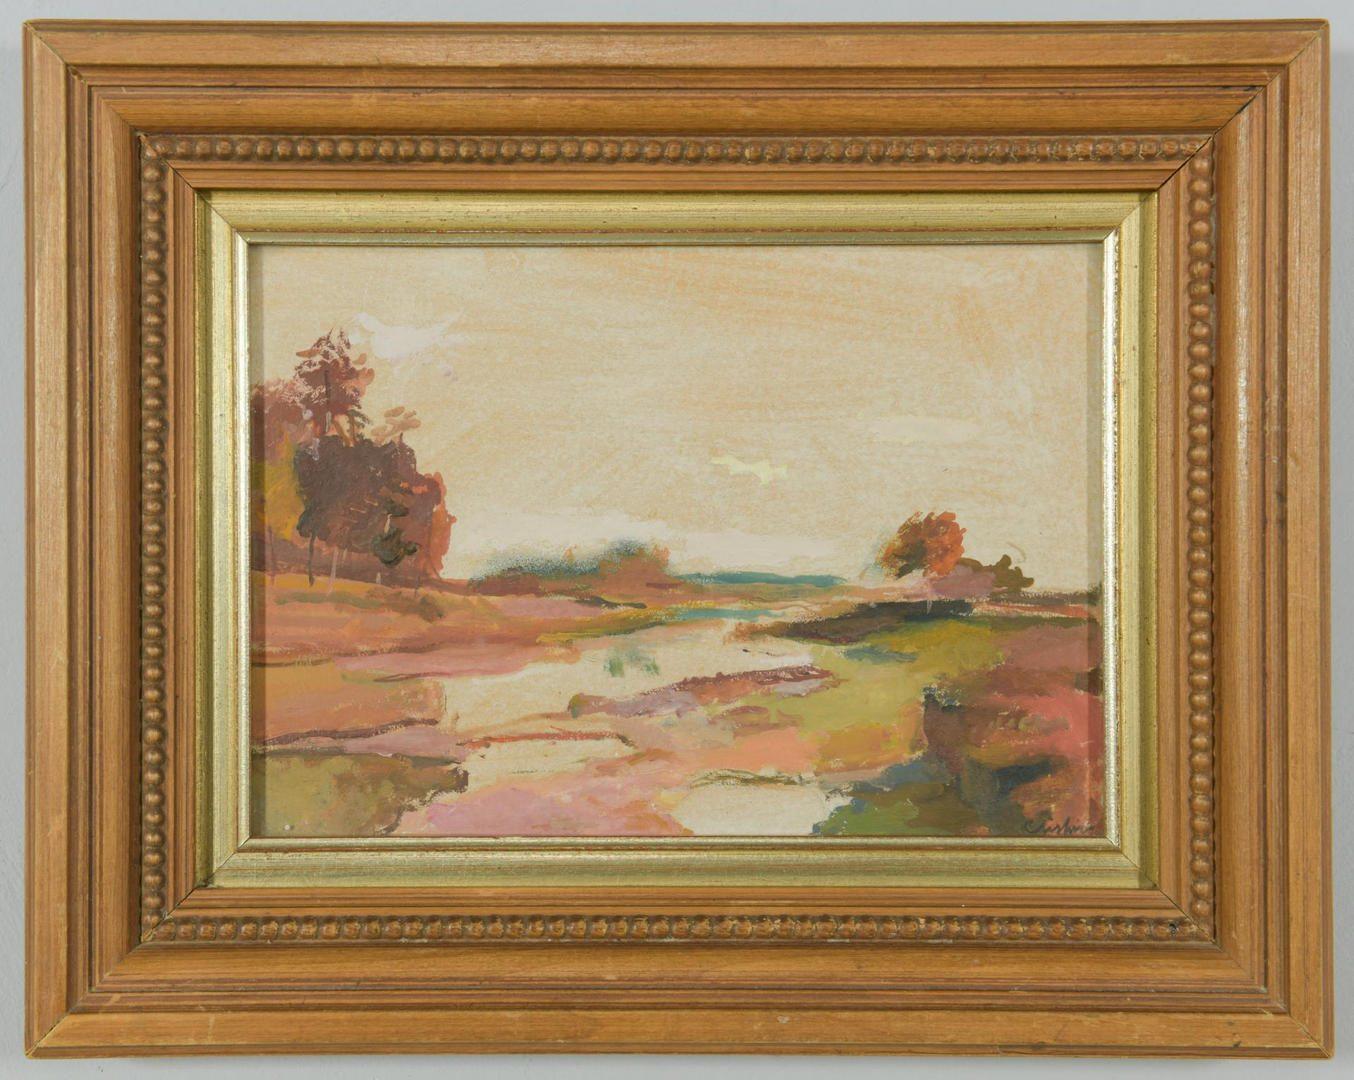 Lot 54: C. Crispini, Pr. Landscapes